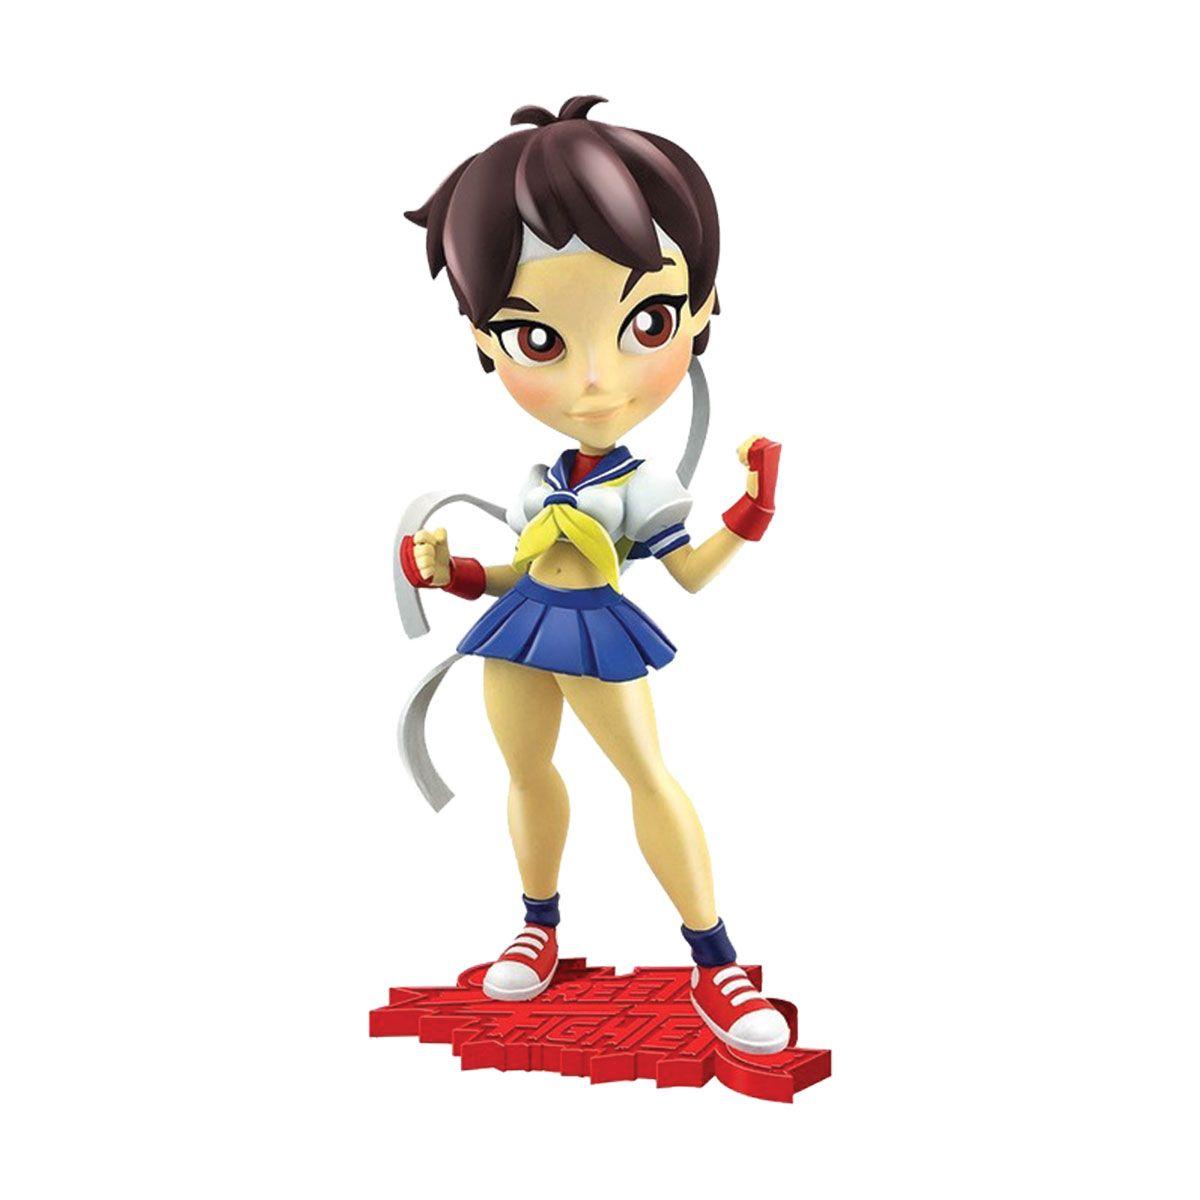 Sakura Street Fighter Knockouts Series 1 Figure Cryptozoic